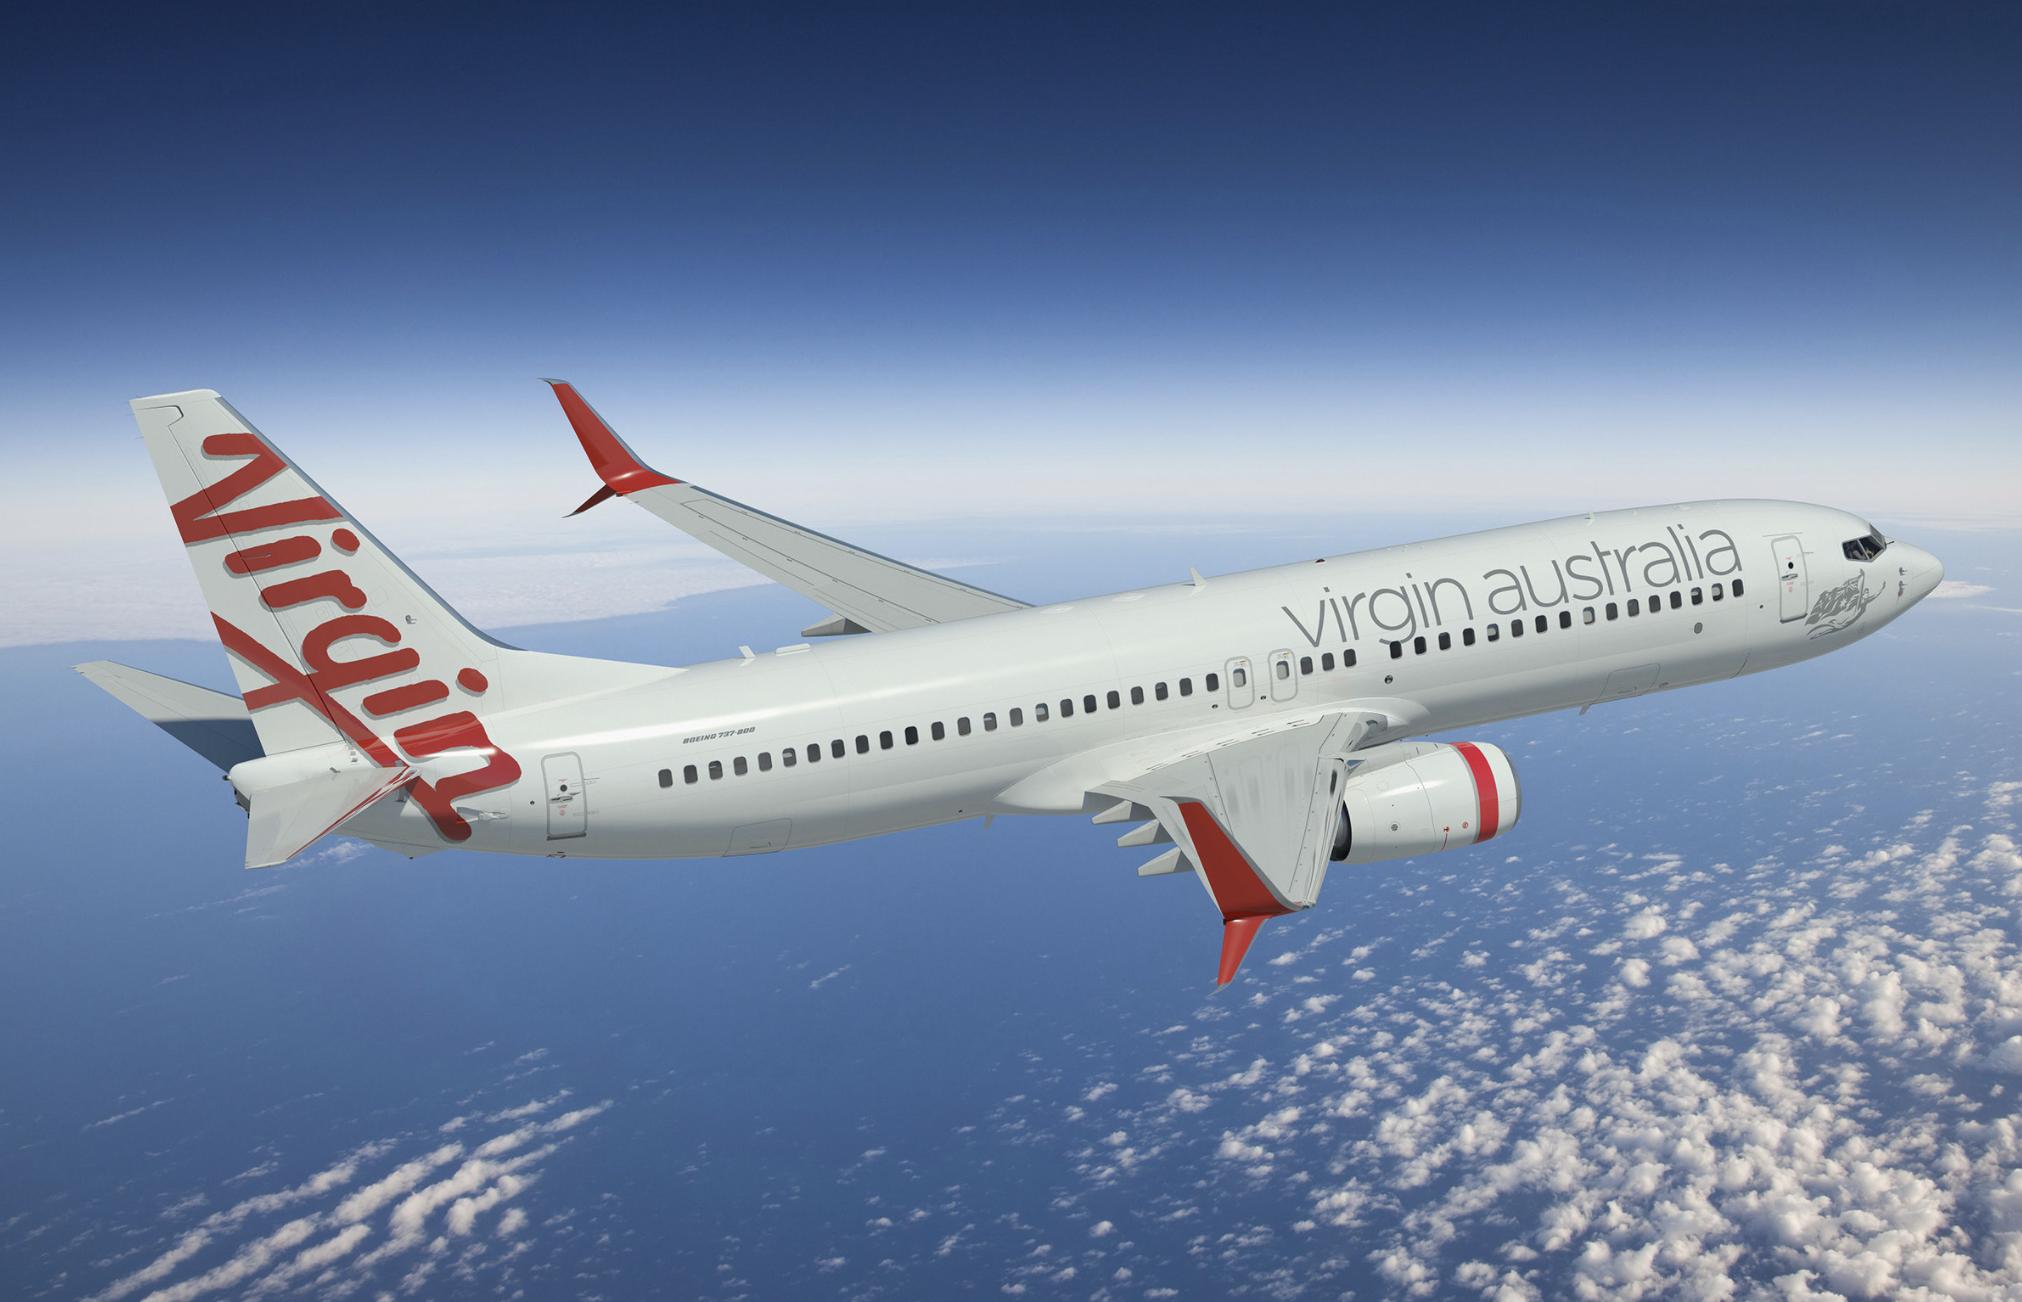 Virgin Australia becomes the first operator of Split Scimitar